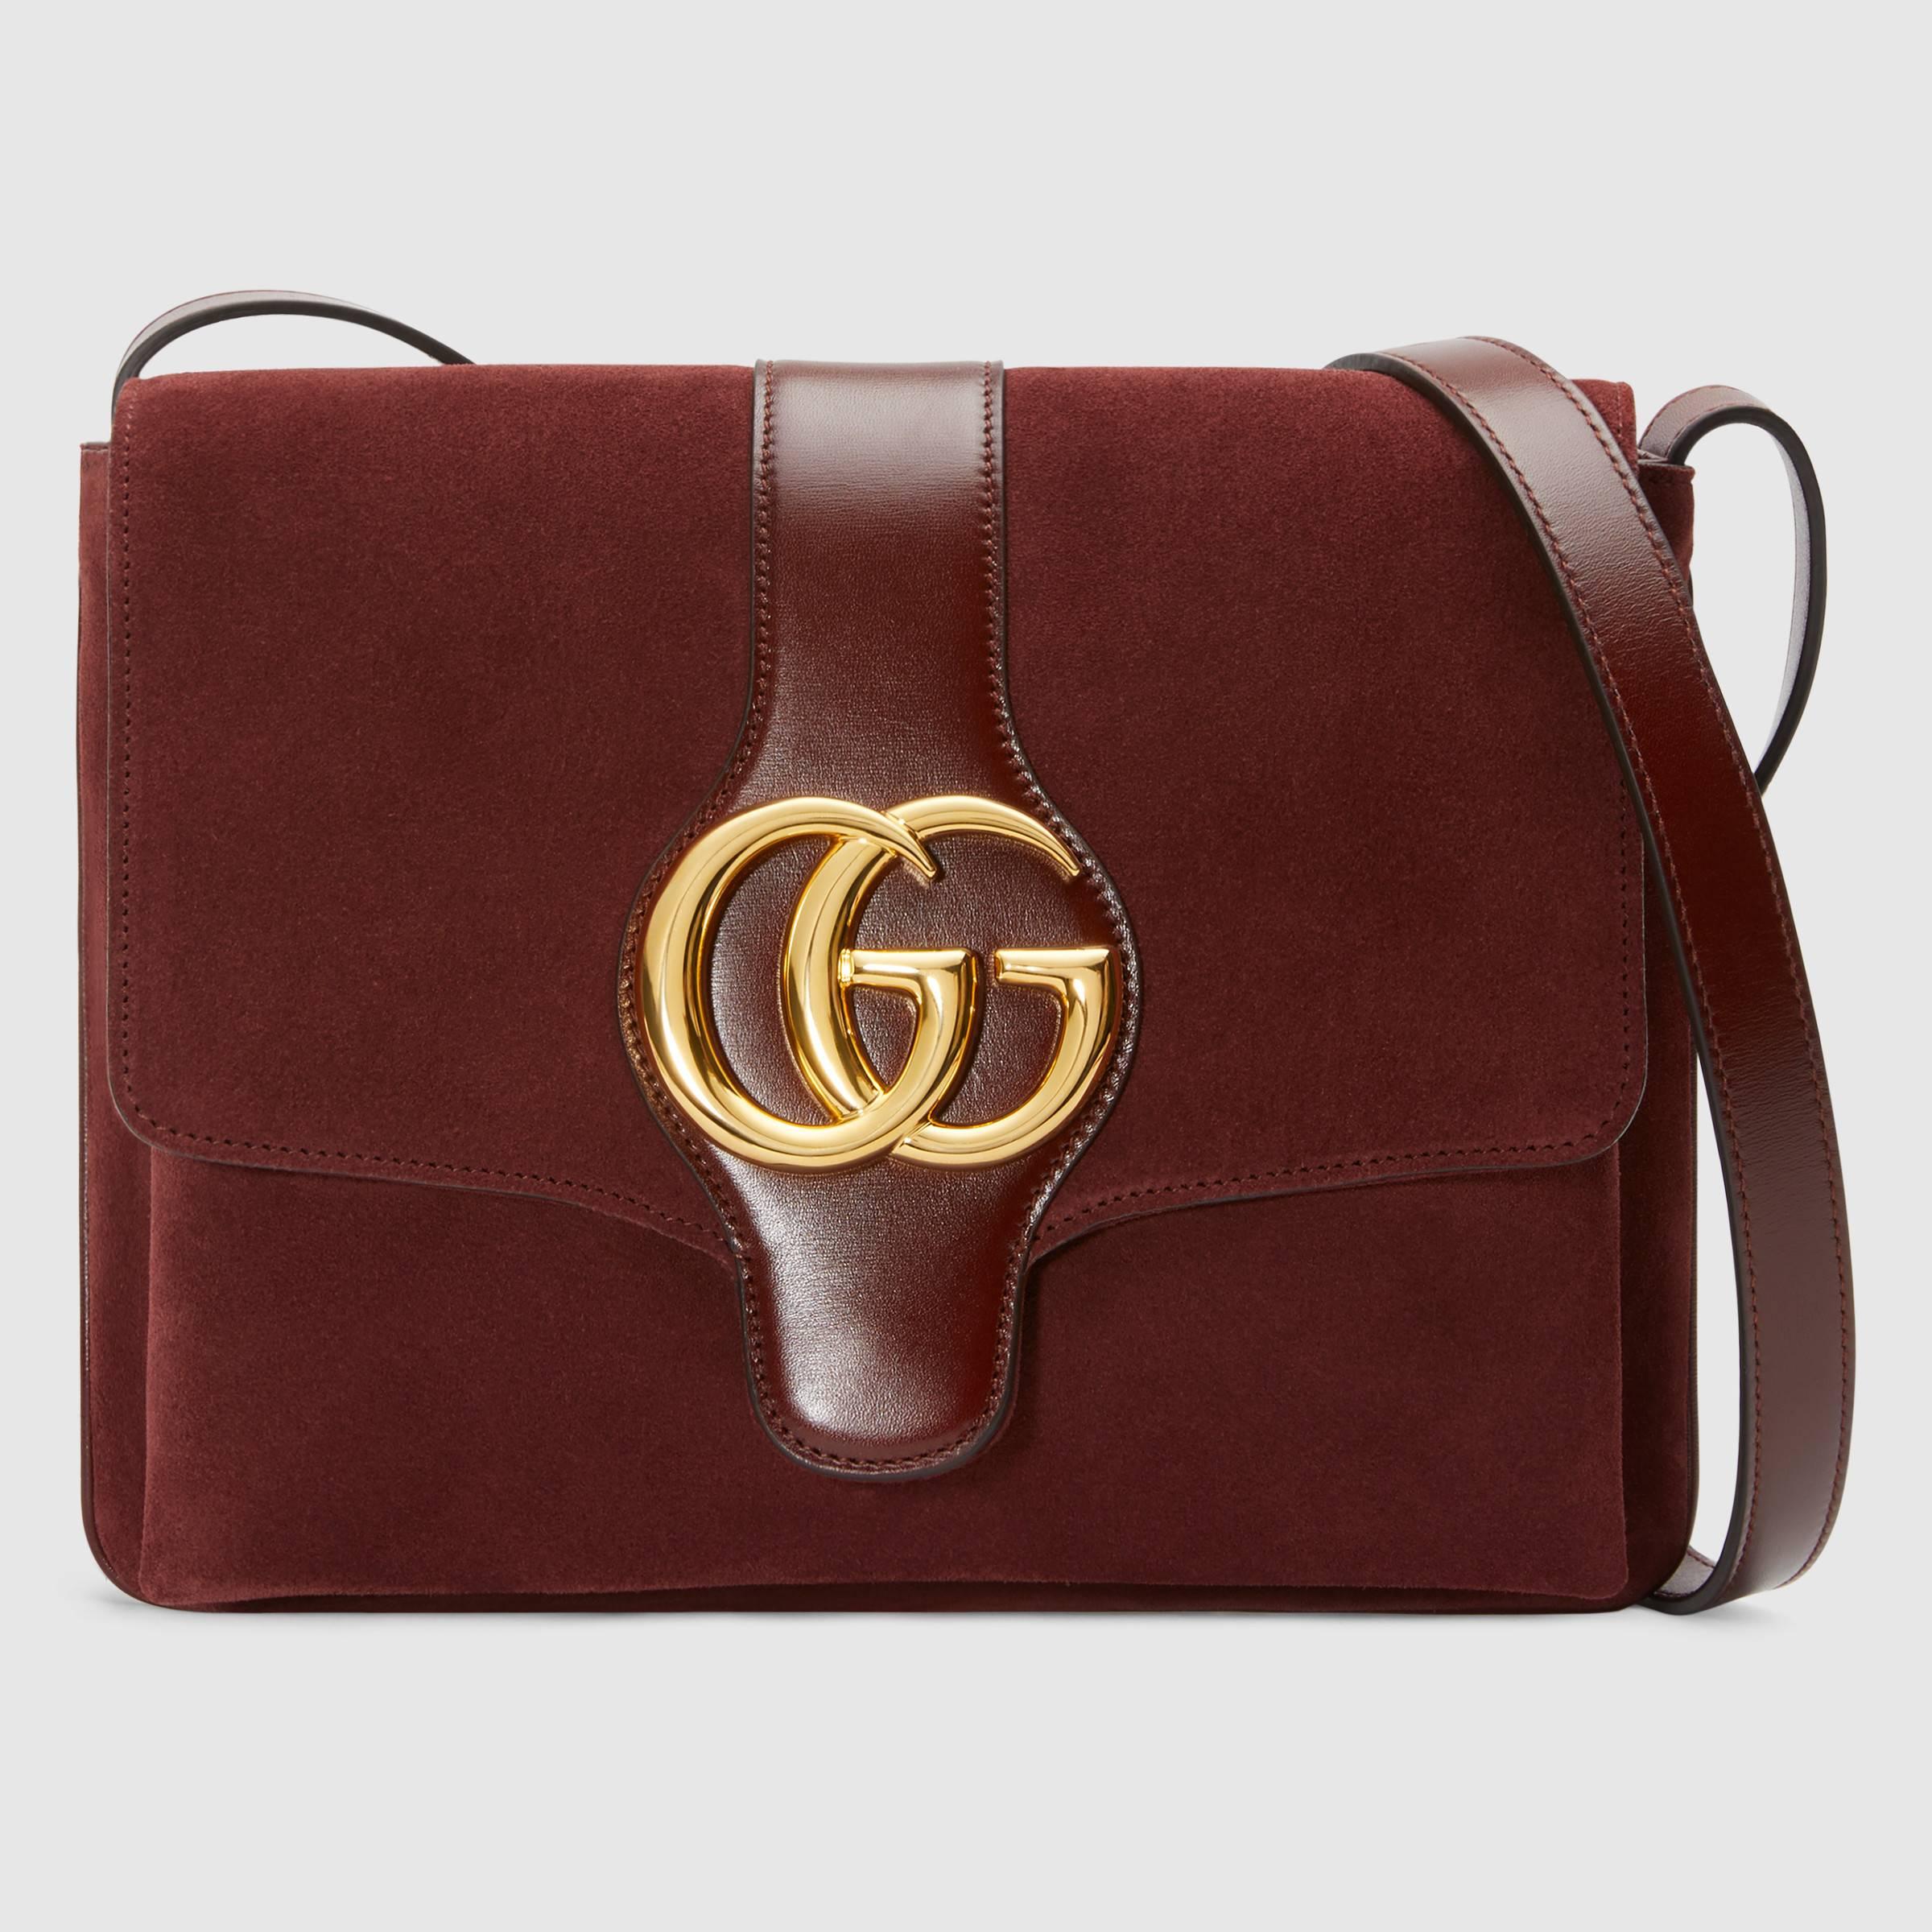 fe653c6fee0f ... about GUCCI handbags. Arli%20(medium)%20Bags.jpg?1553983107275